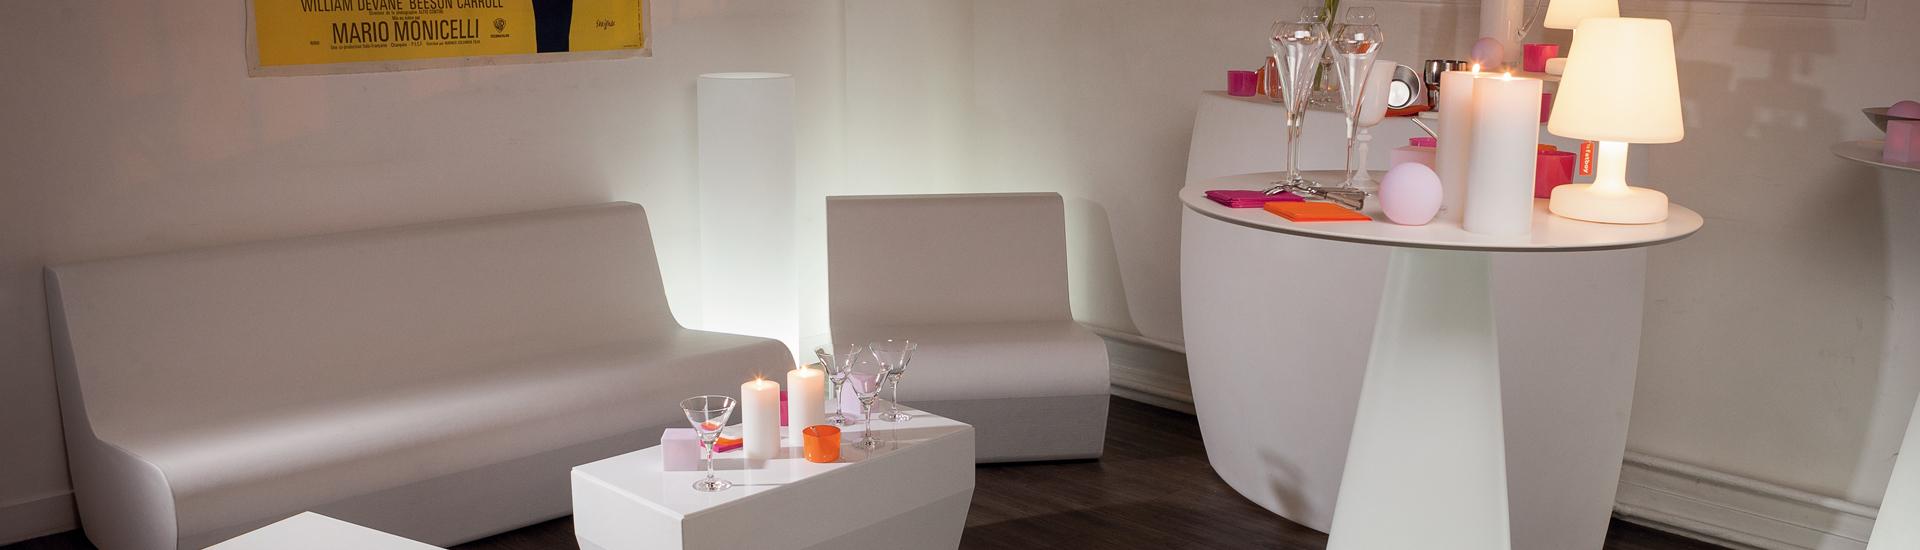 Location mobilier design